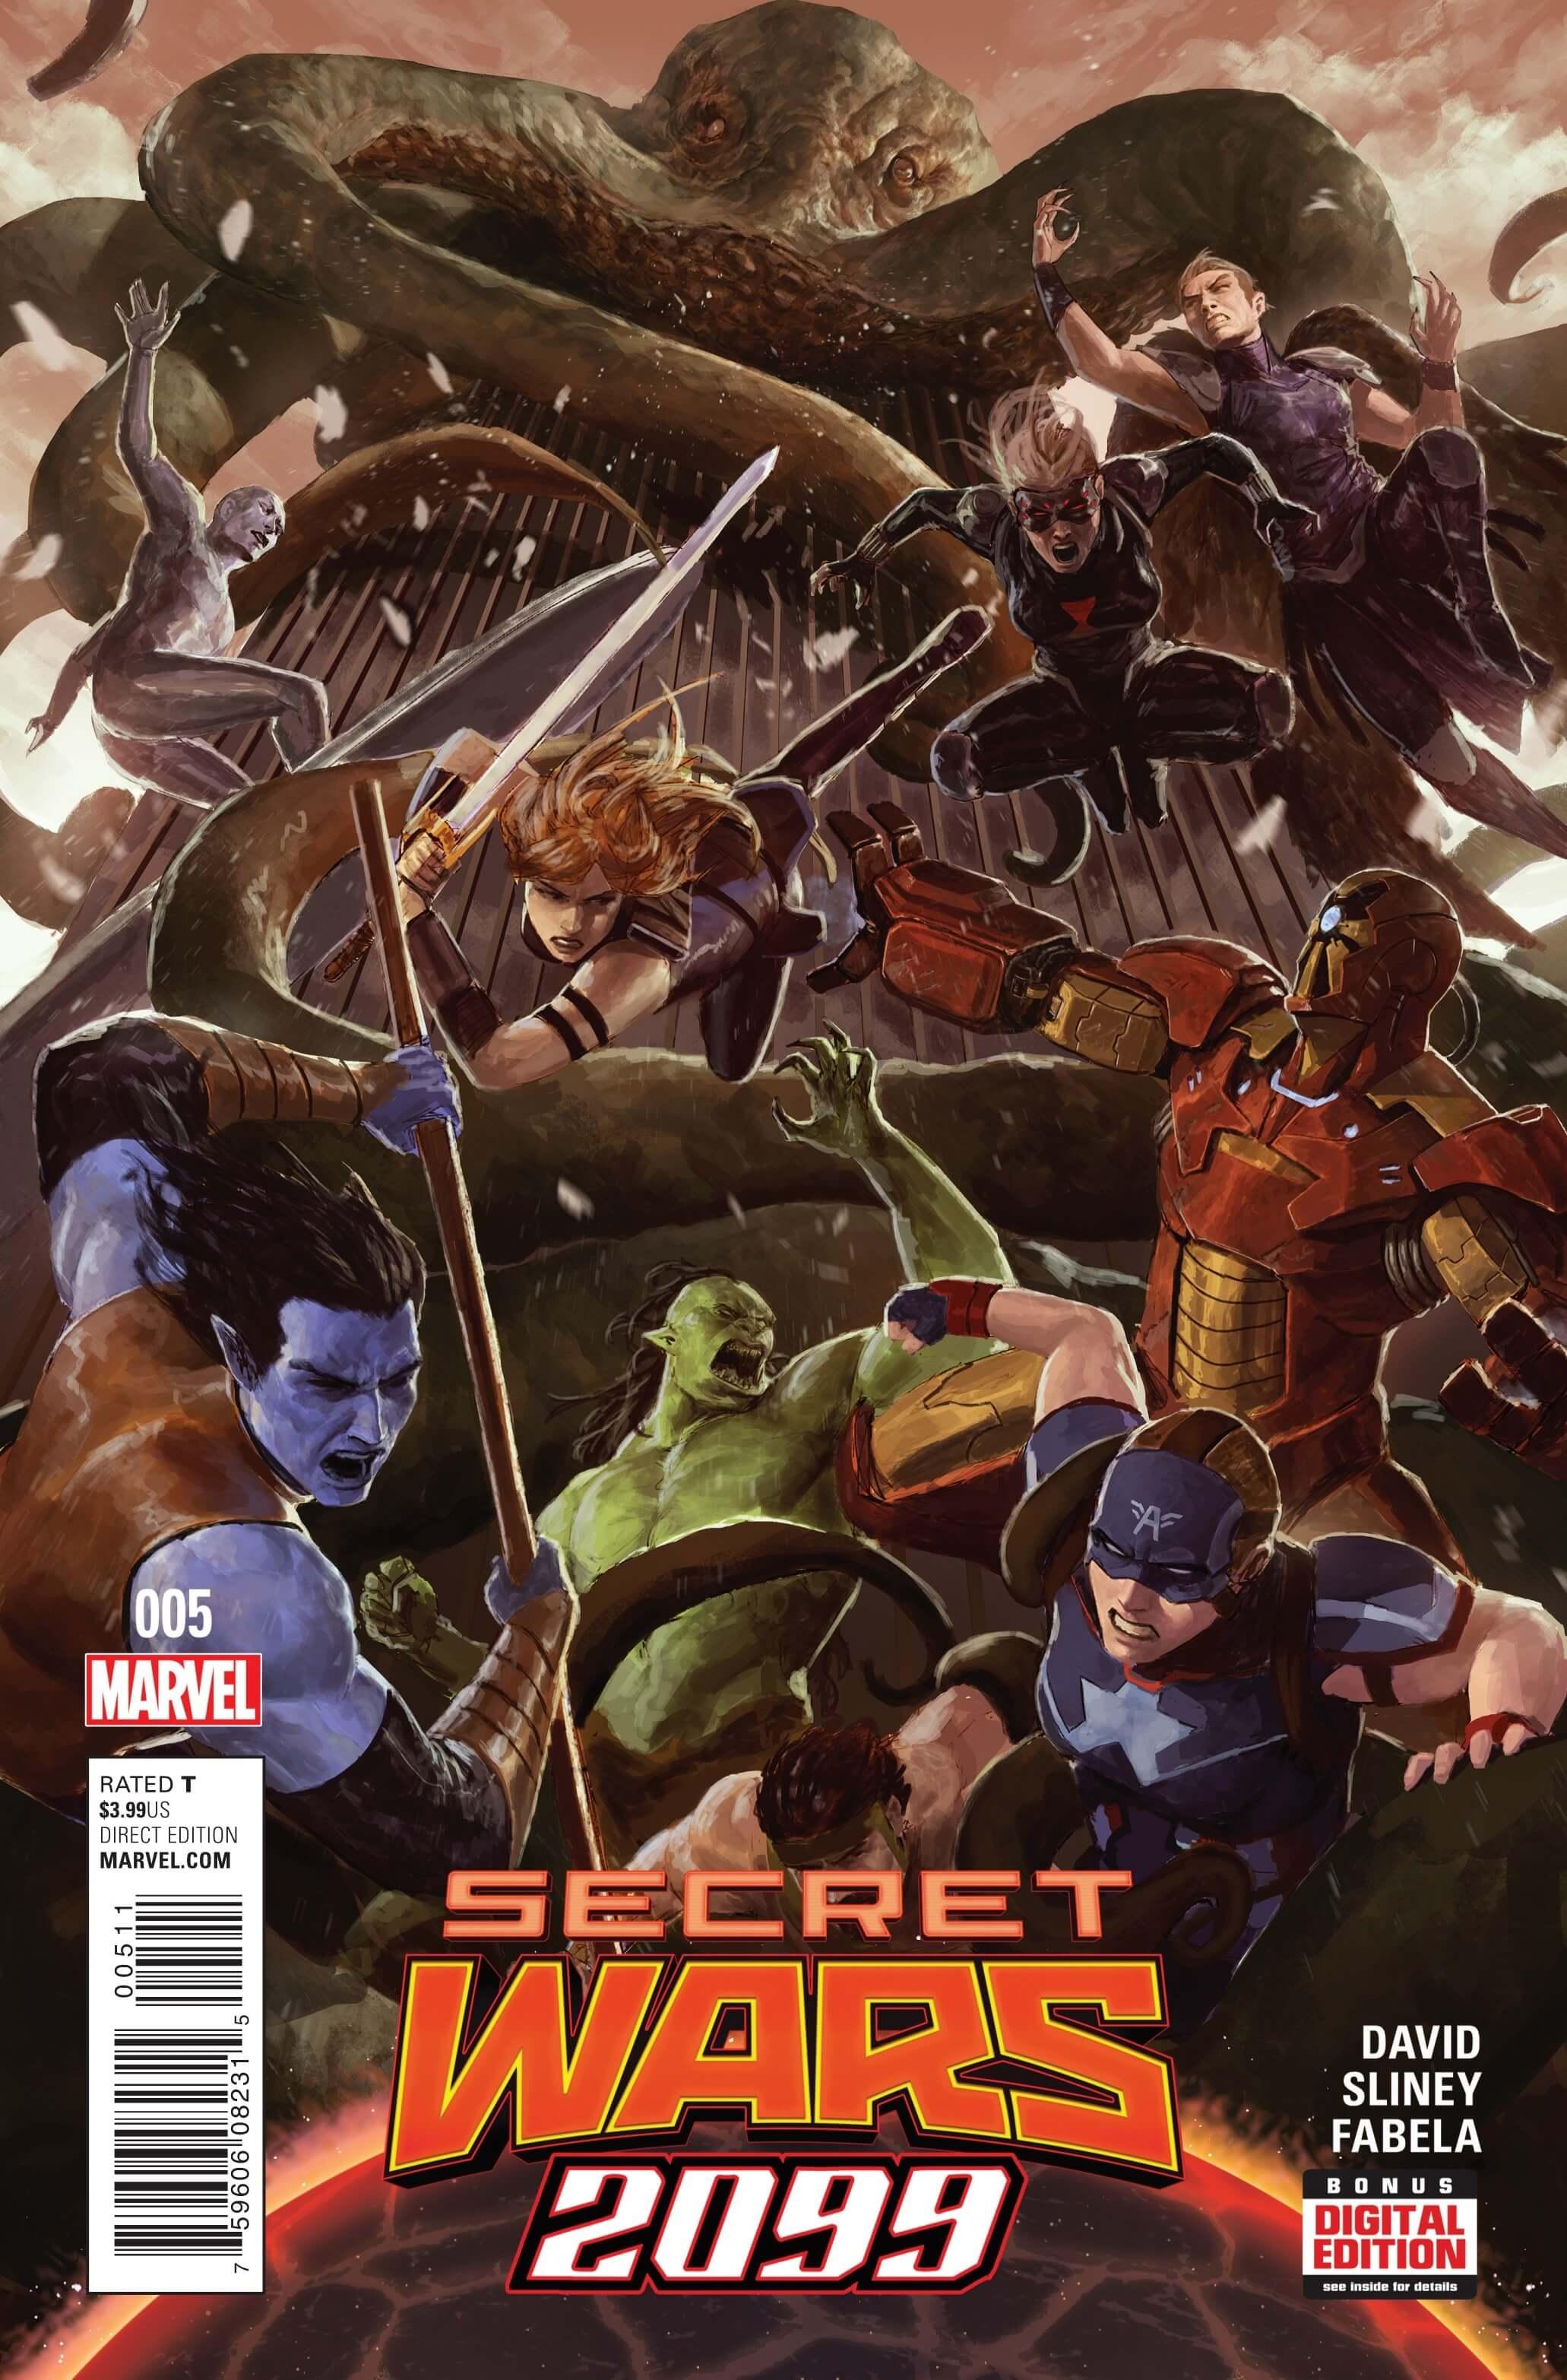 Secret Wars 2099 #5cvr